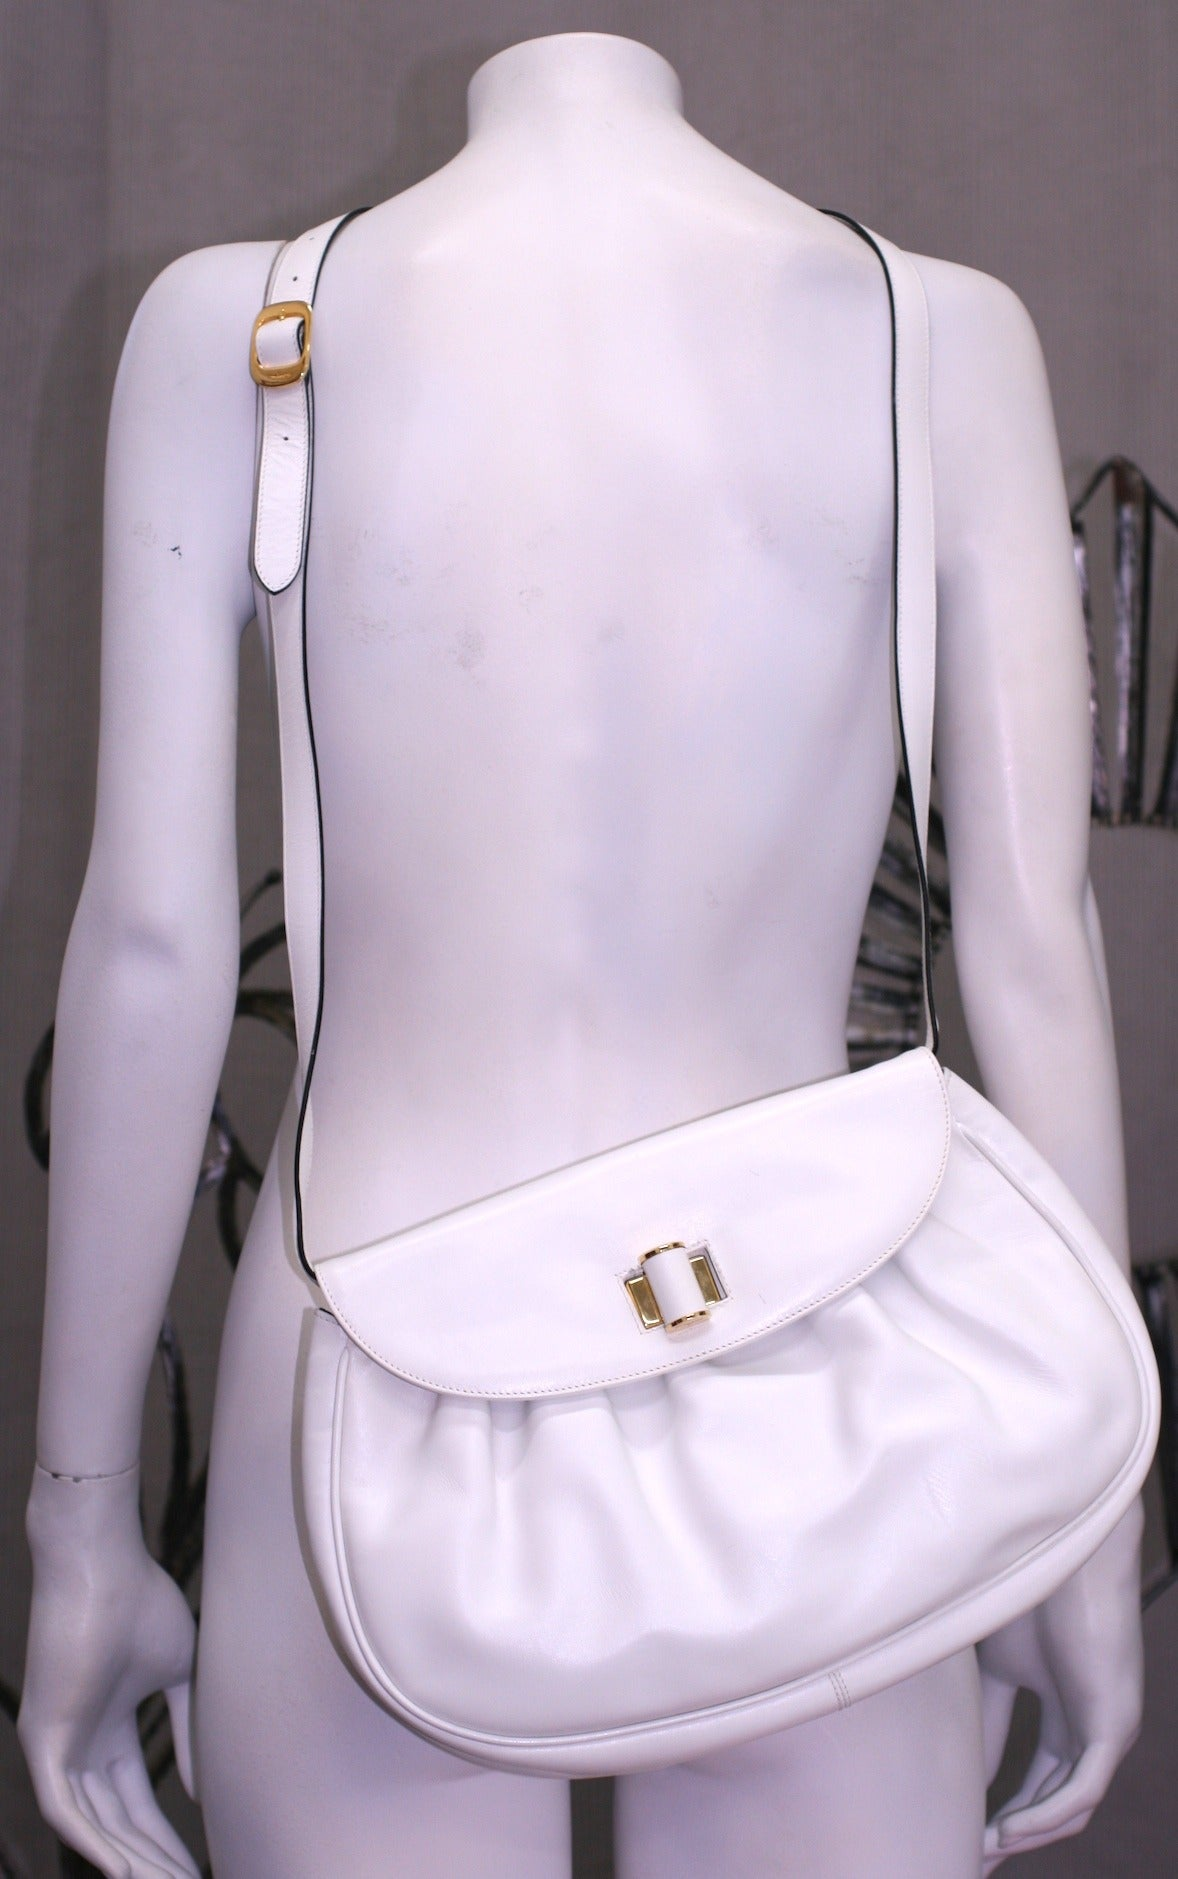 Ferragamo White Calf Shoulder Bag In Excellent Condition For Sale In Riverdale, NY